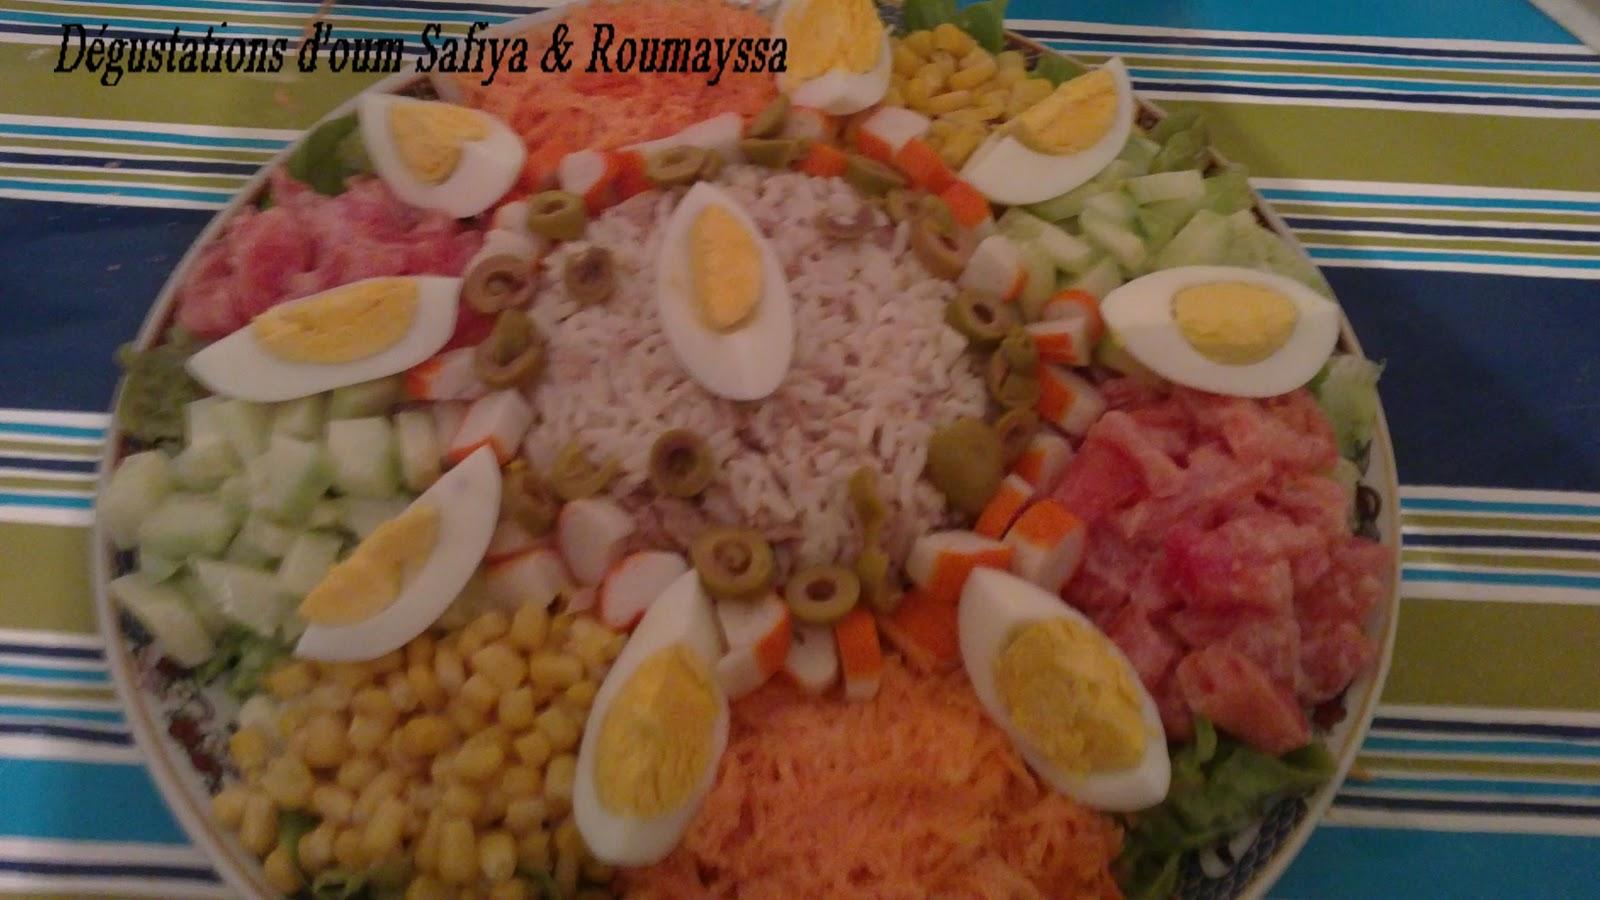 Top Dégustations d'Oum Safiya: Salade composé TM84